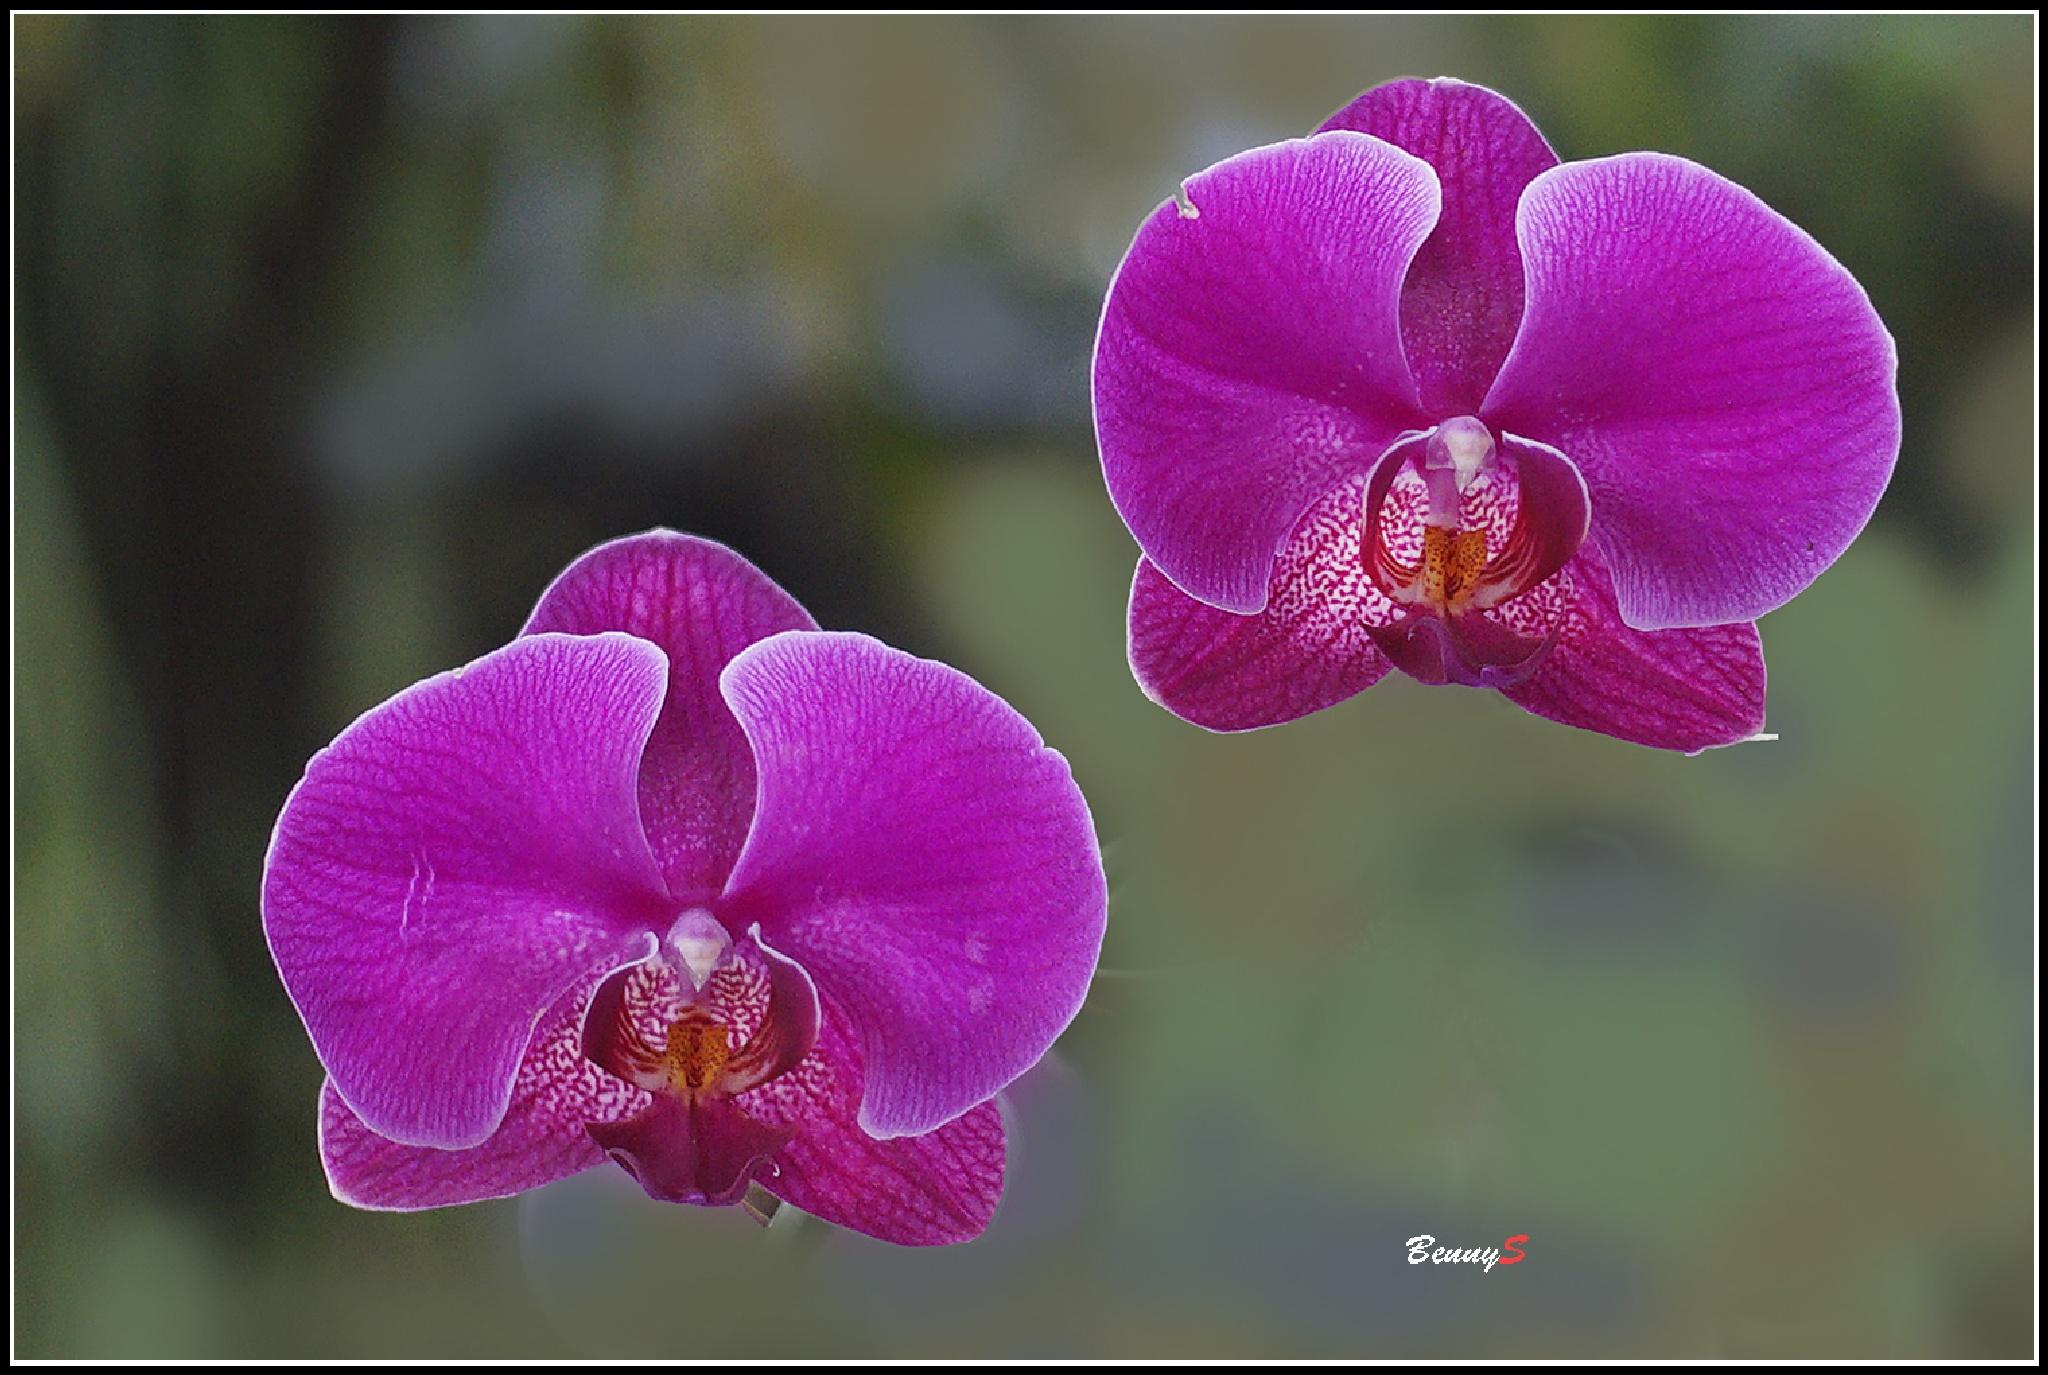 Orchid by bennysjafrudin